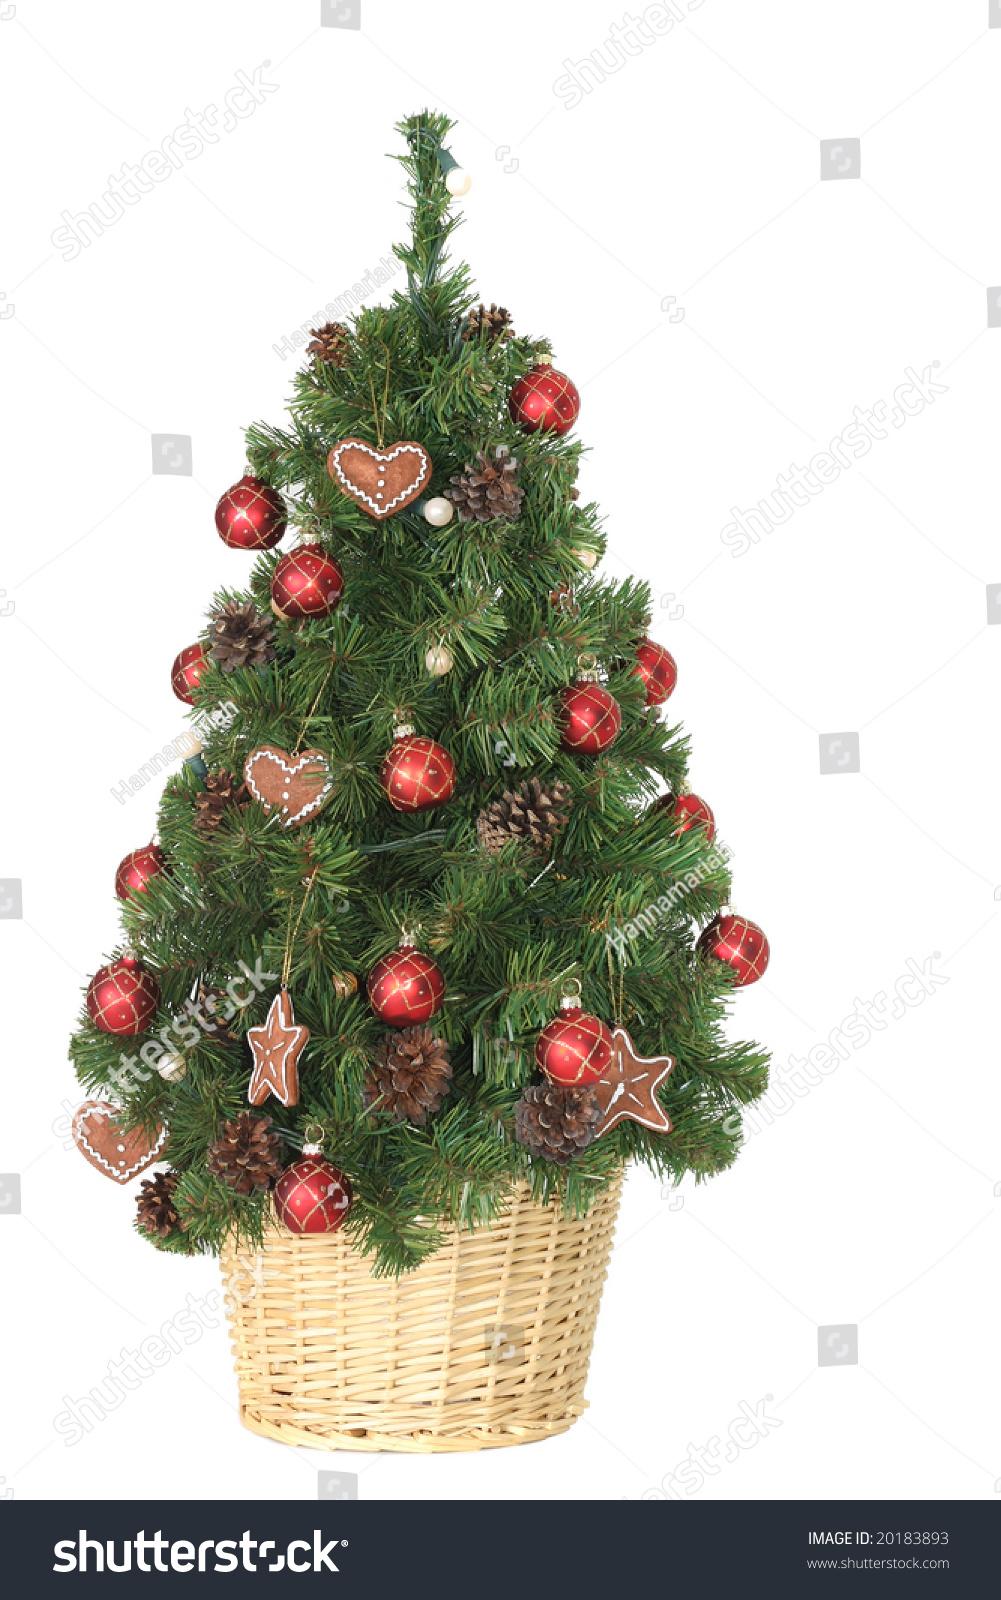 Pretty Decorated Christmas Tree Stock Photo 20183893